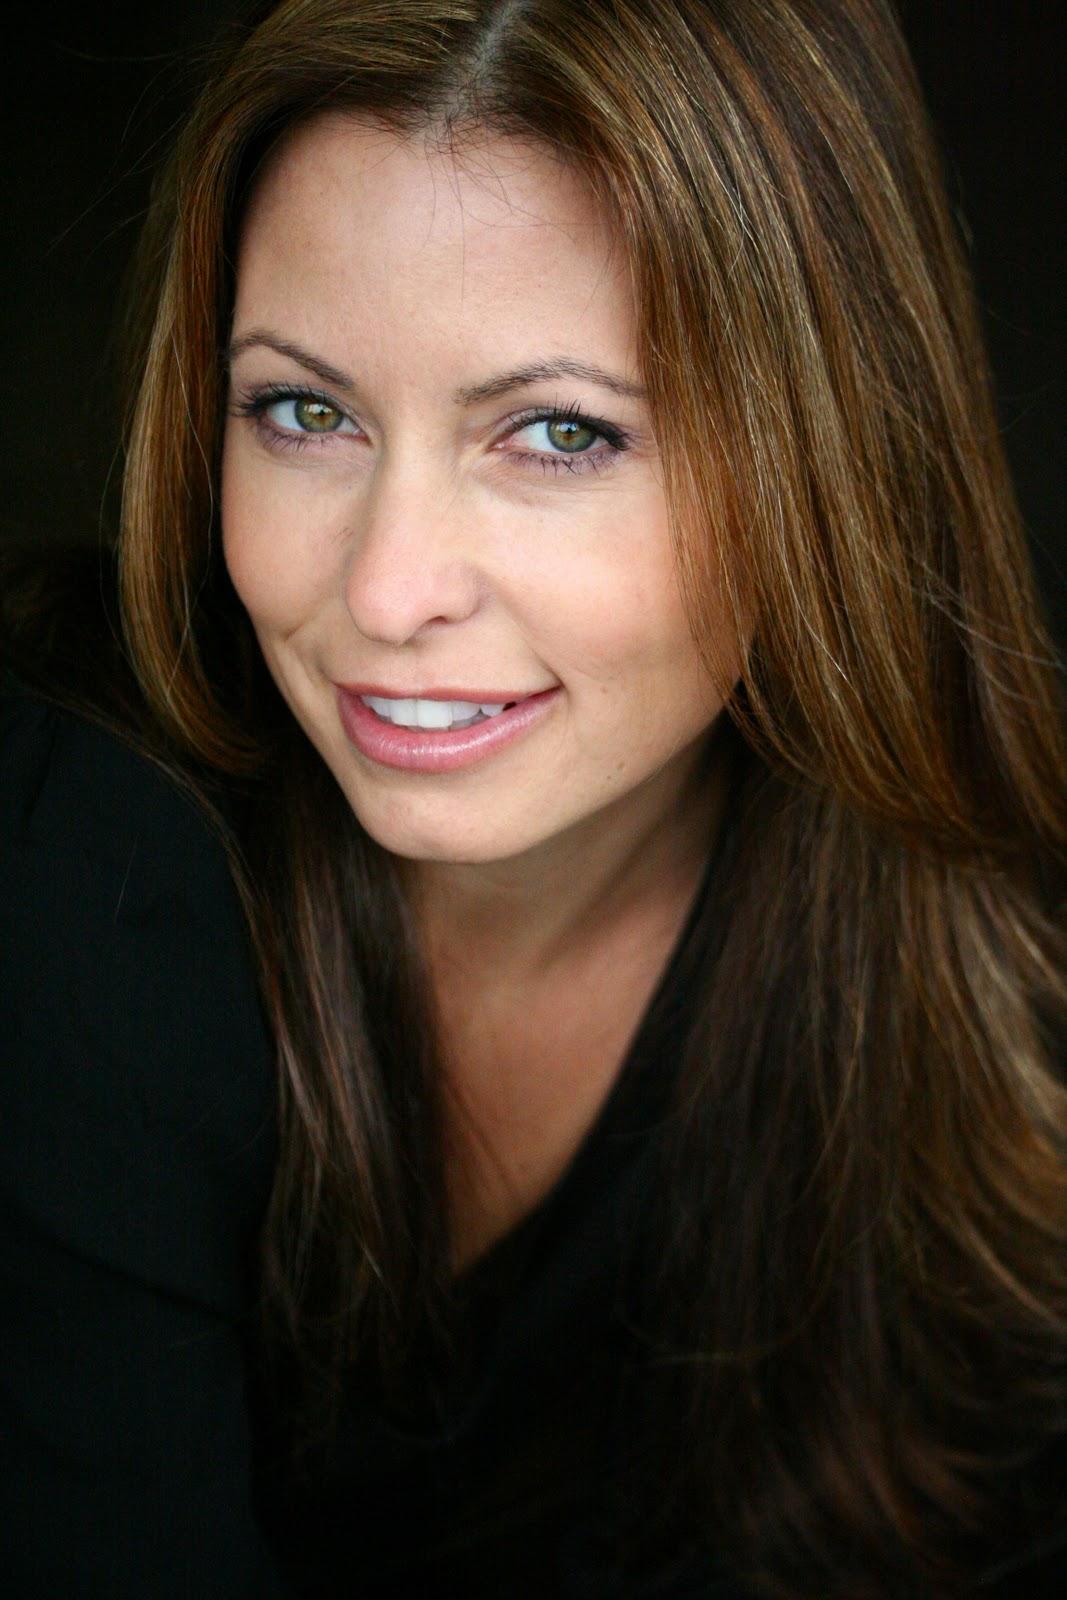 Watch Paige Segal video